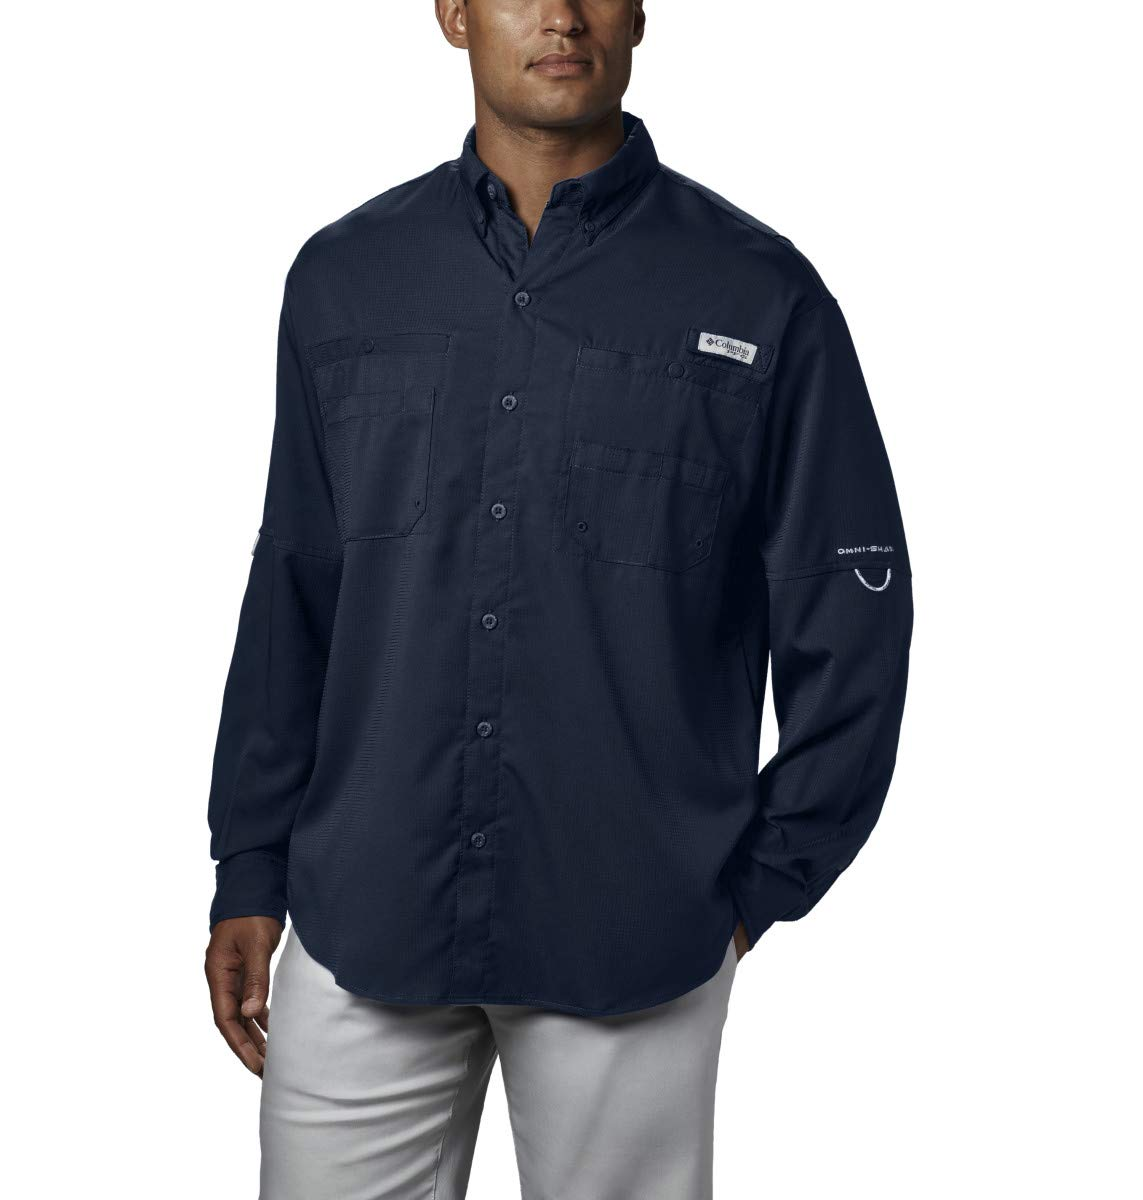 Columbia Men's PFG Tamiami II Long Sleeve Shirt - Big , Collegiate Navy, X-Small